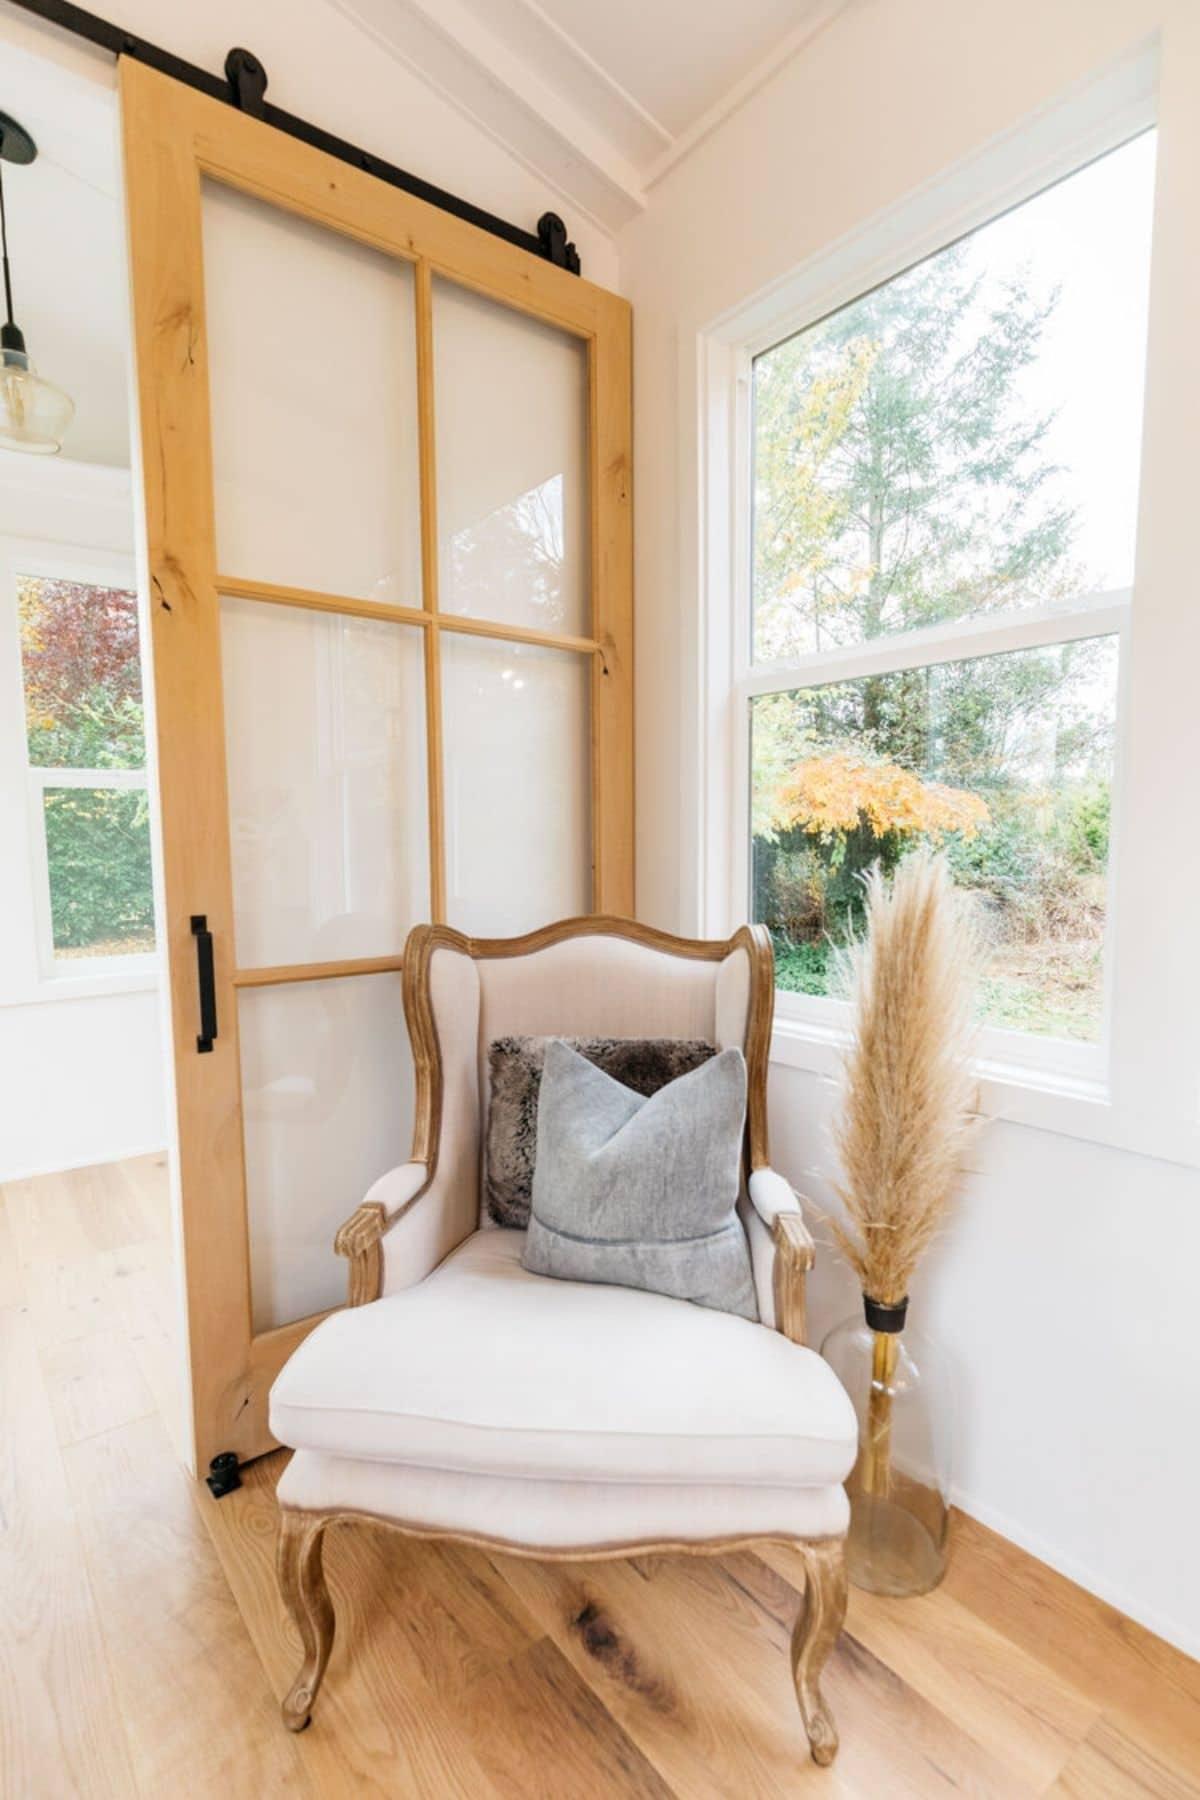 Chair in corner by window and glass pane barn door